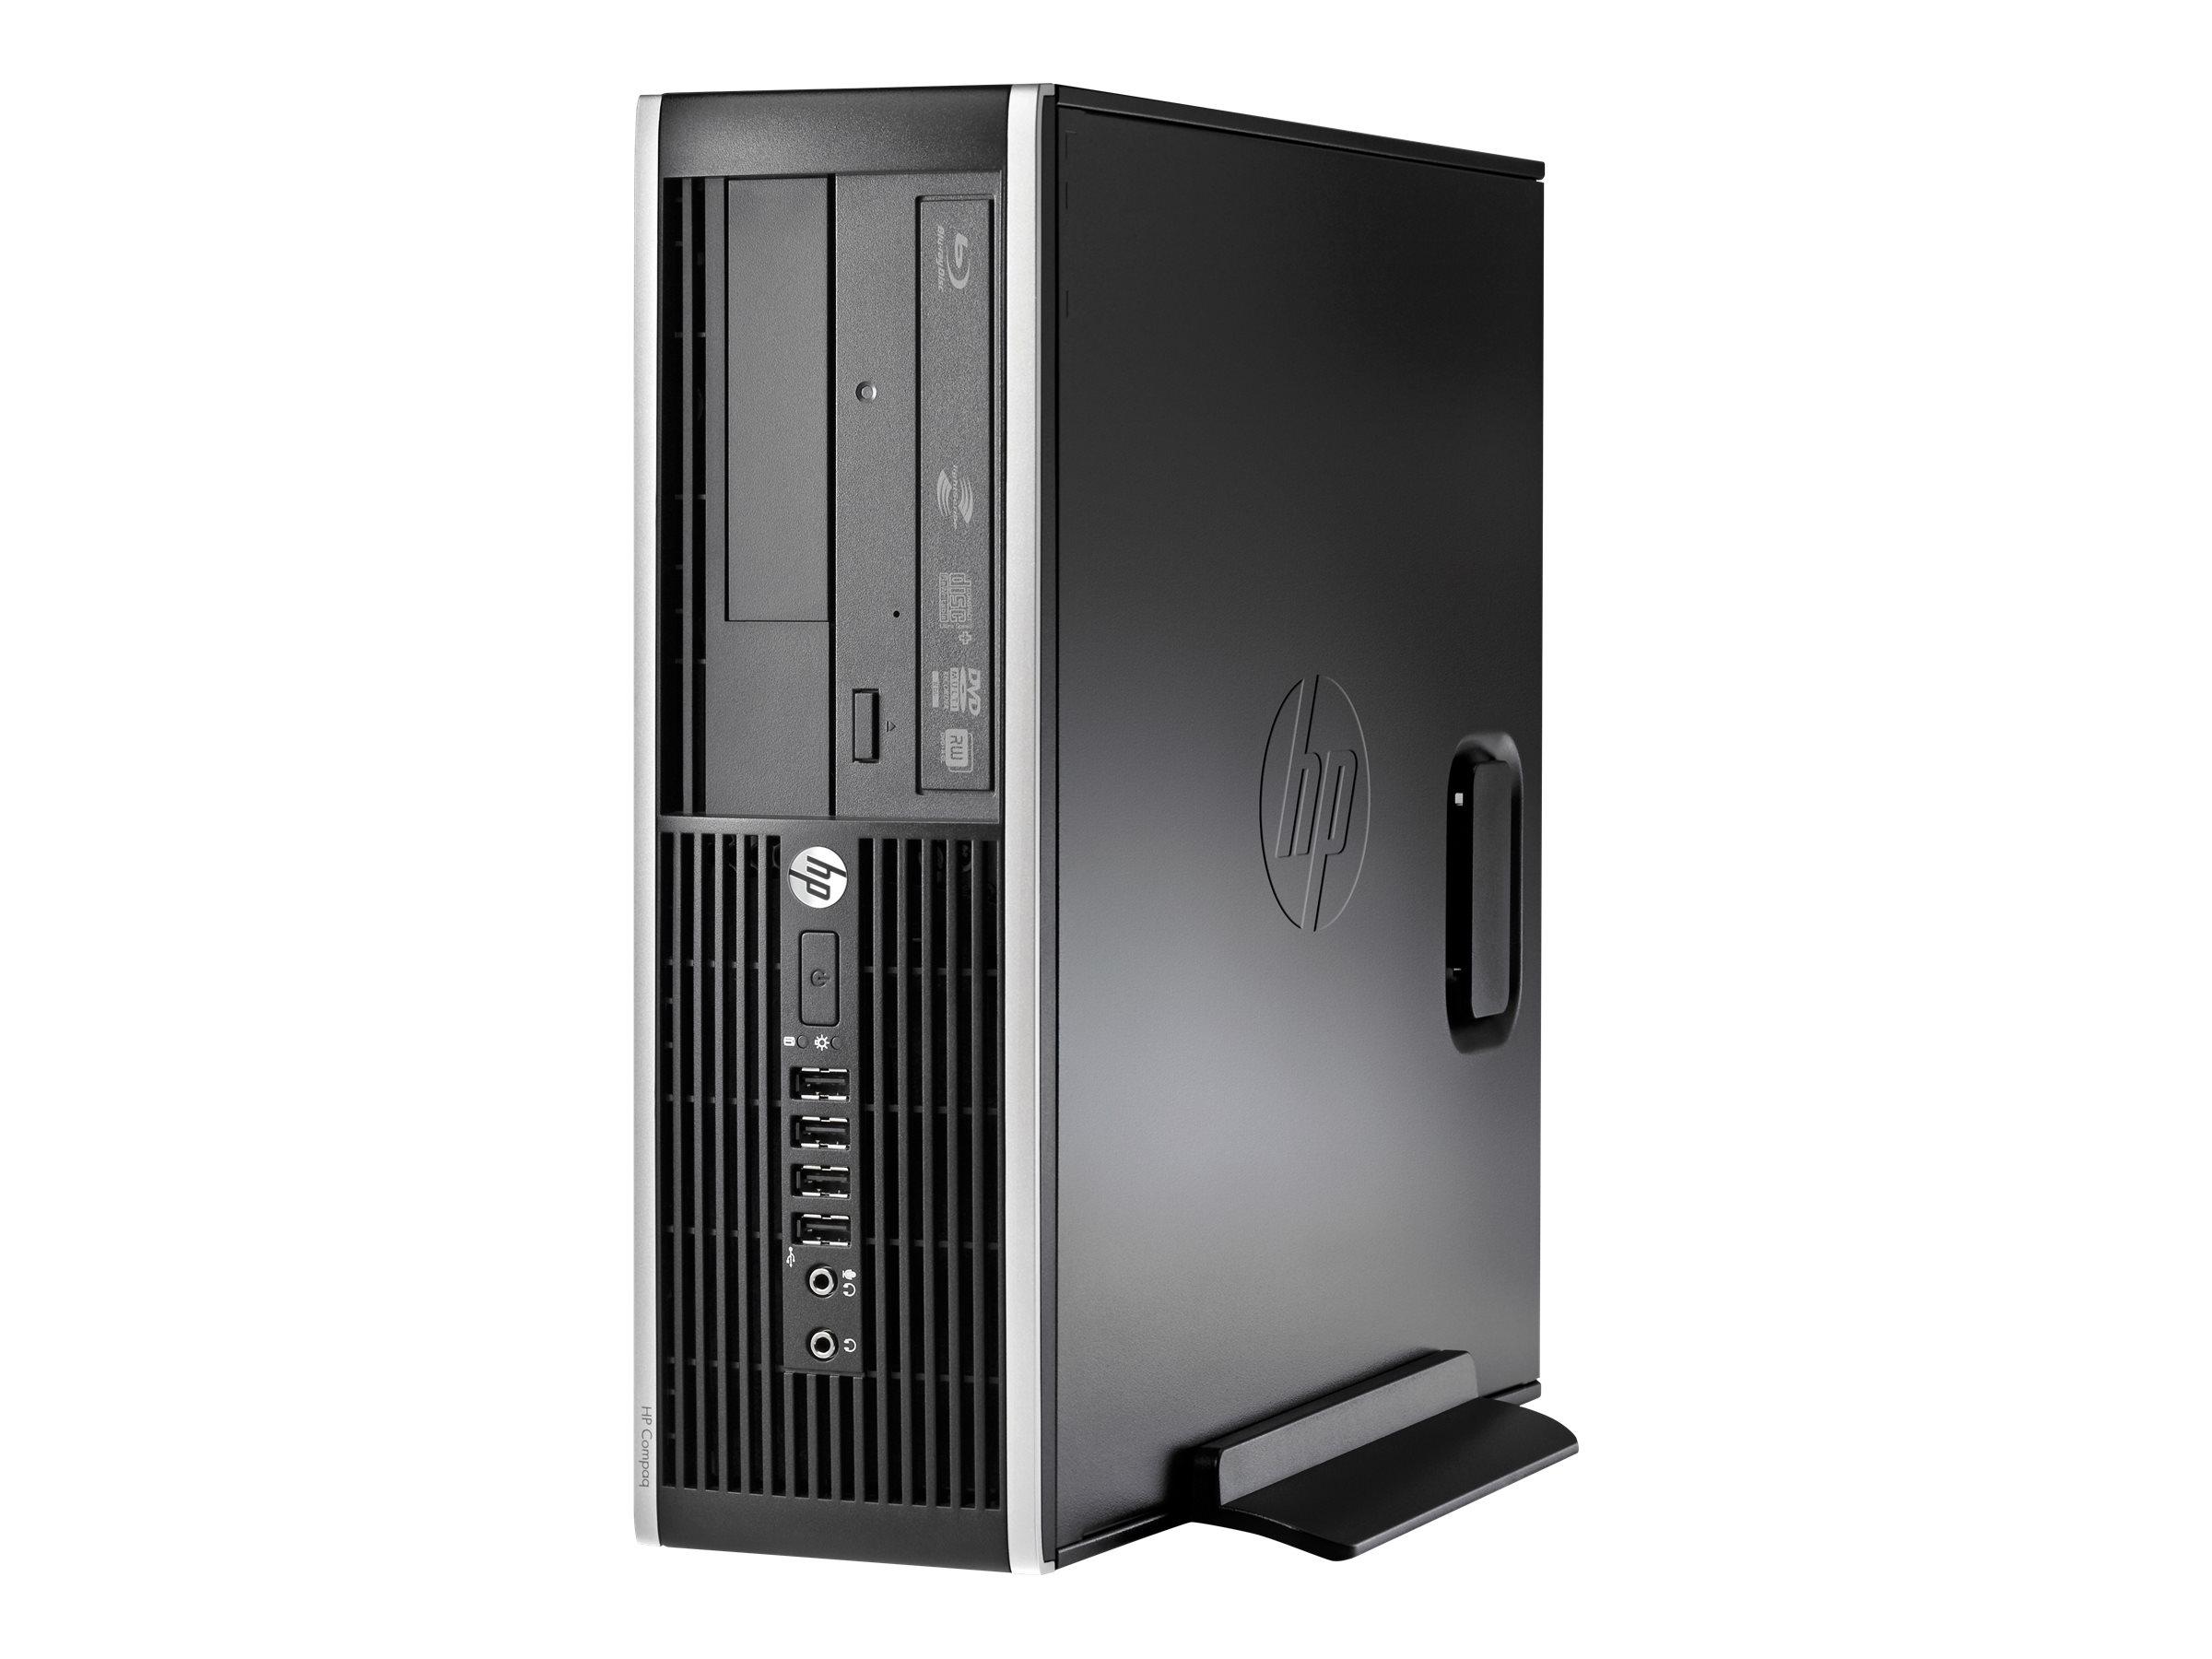 HP 6005 Pro - ordinateur de bureau reconditionné - SFF - AMD PHENOM II 3GHZ - 4Go -  250Go - Win 7 pro